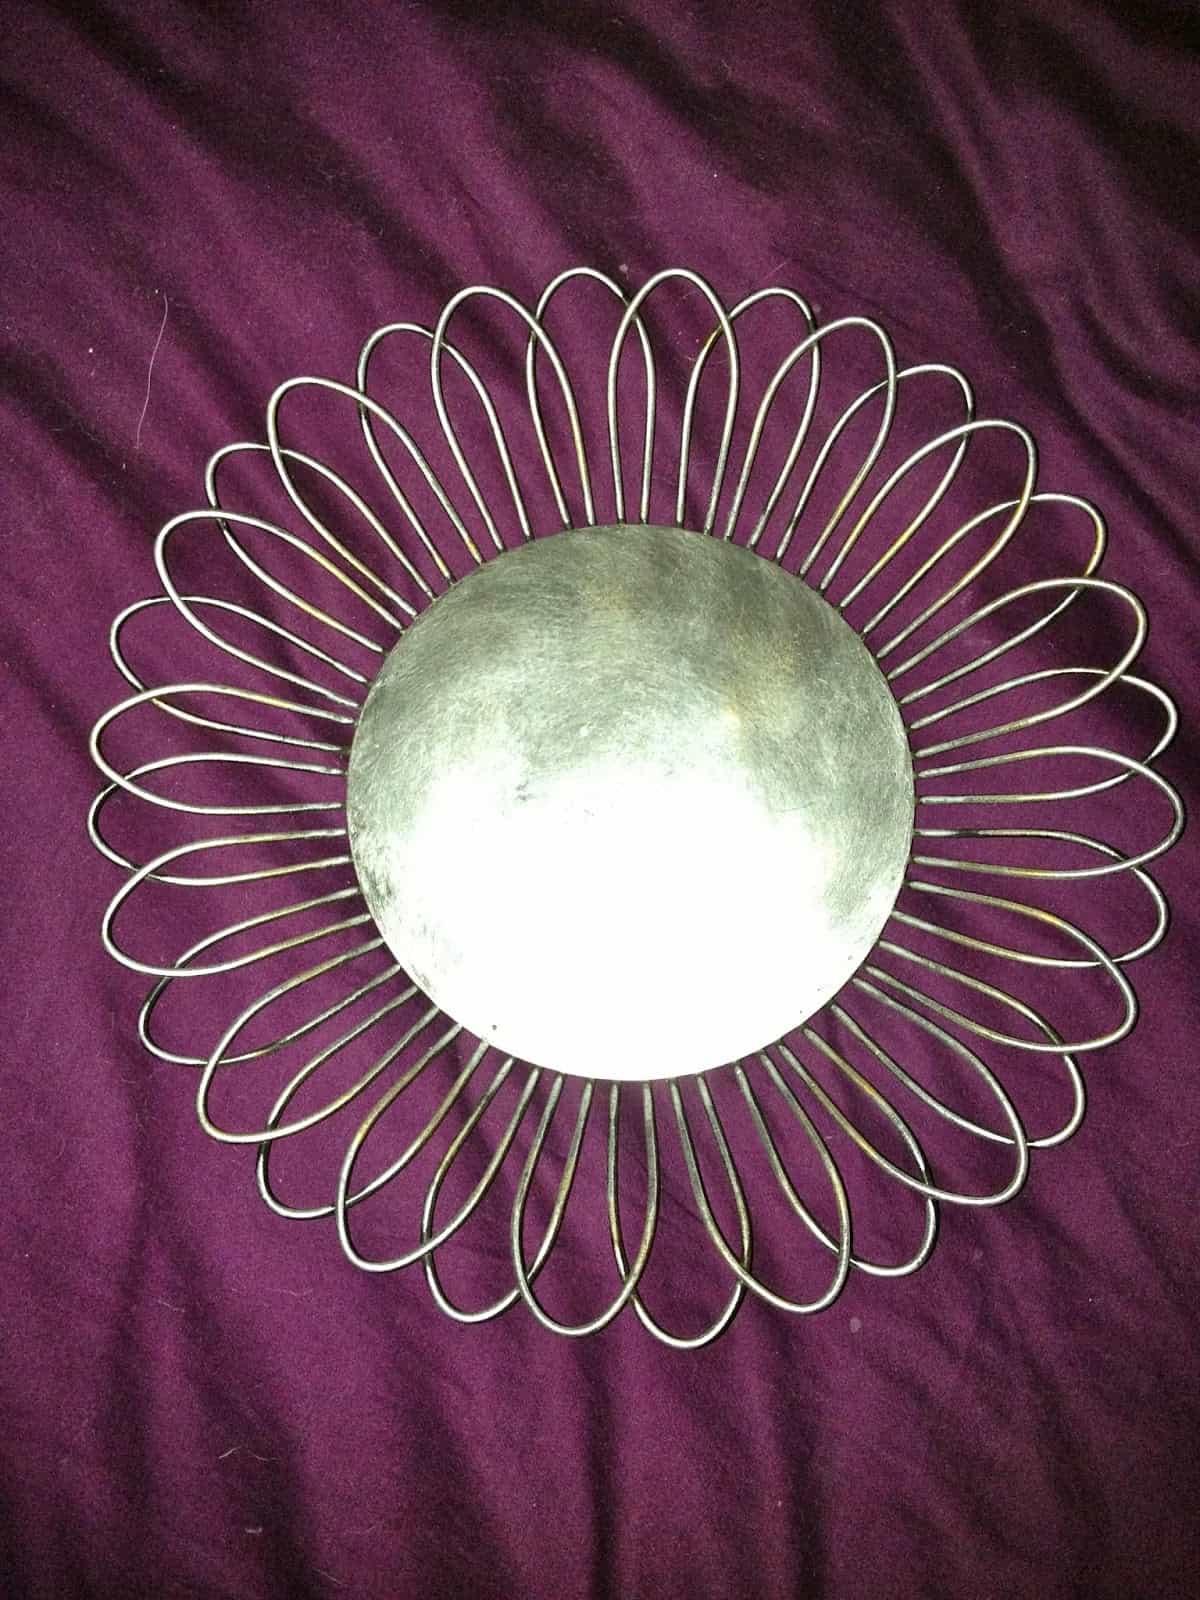 silver metal flower on a purple background